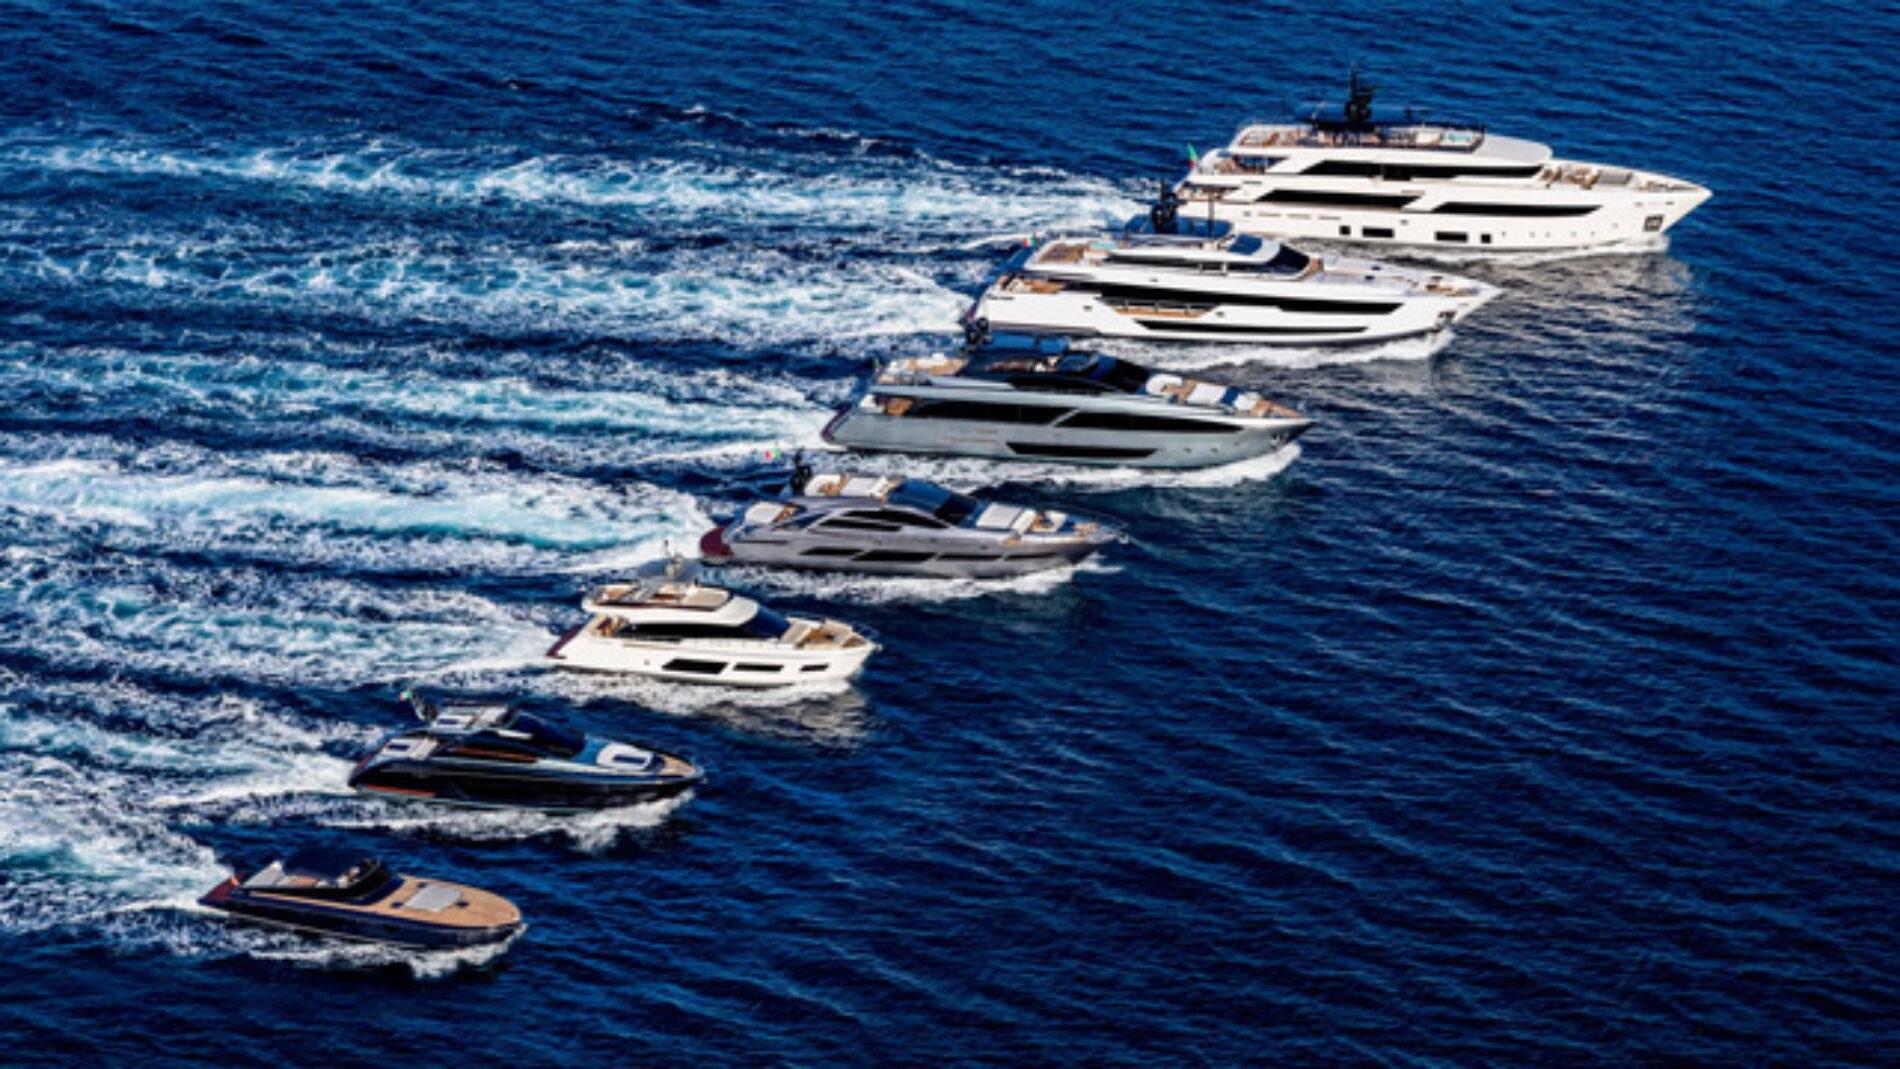 Flotta-FG_Cannes-Yachting-Festival-2018